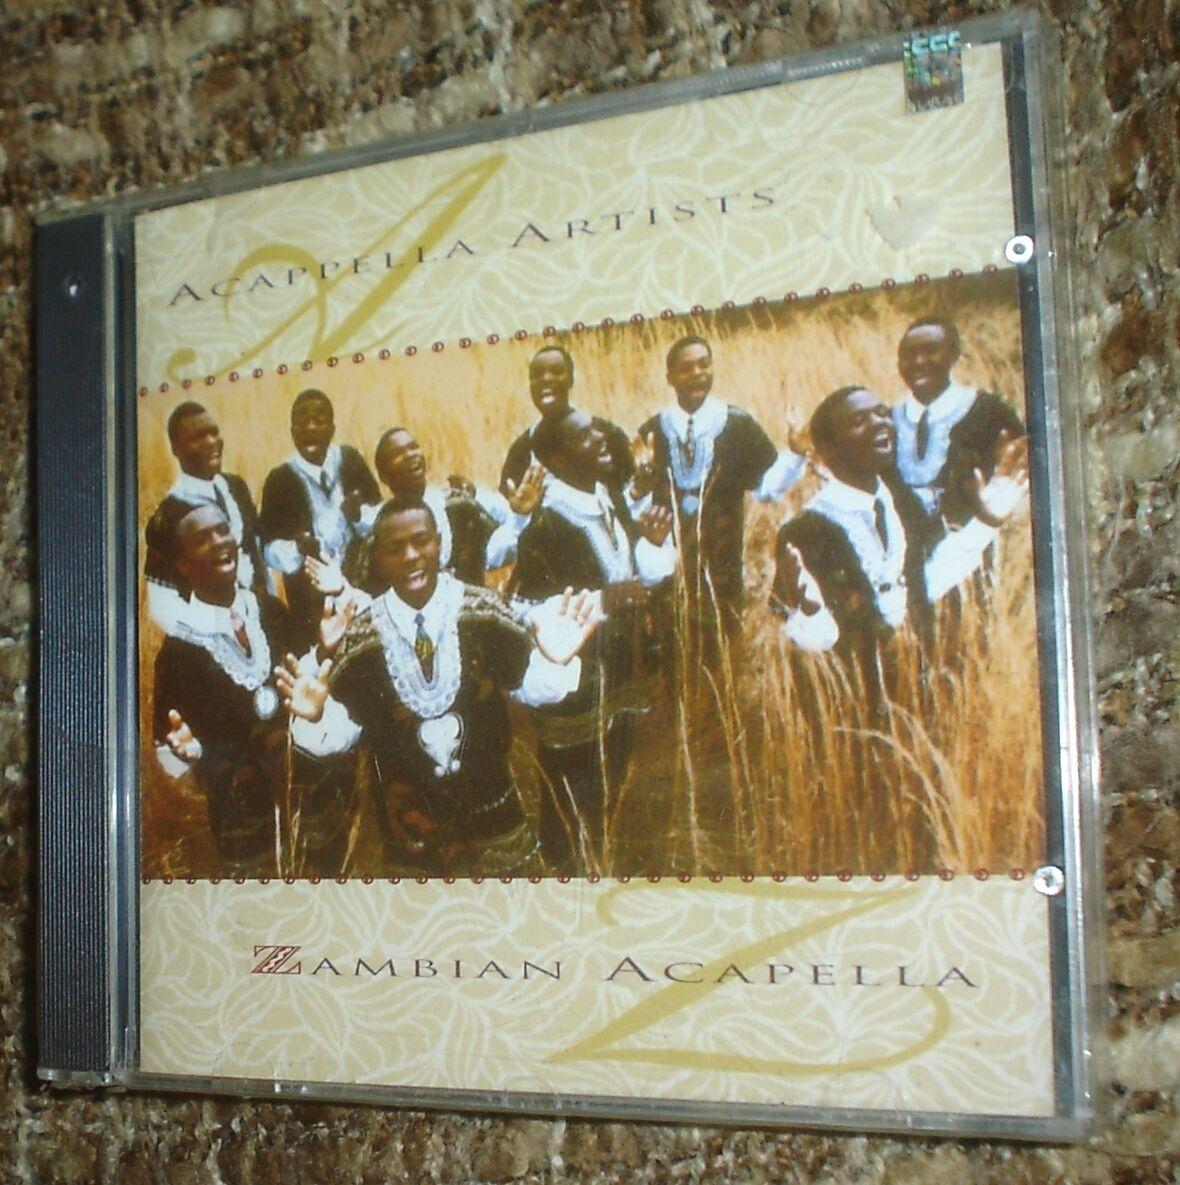 ZAMBIAN ACAPELLA CD, NEW AND SEALED, VERY RARE, ACAPPELLA ARTISTS, 10 TRACKS